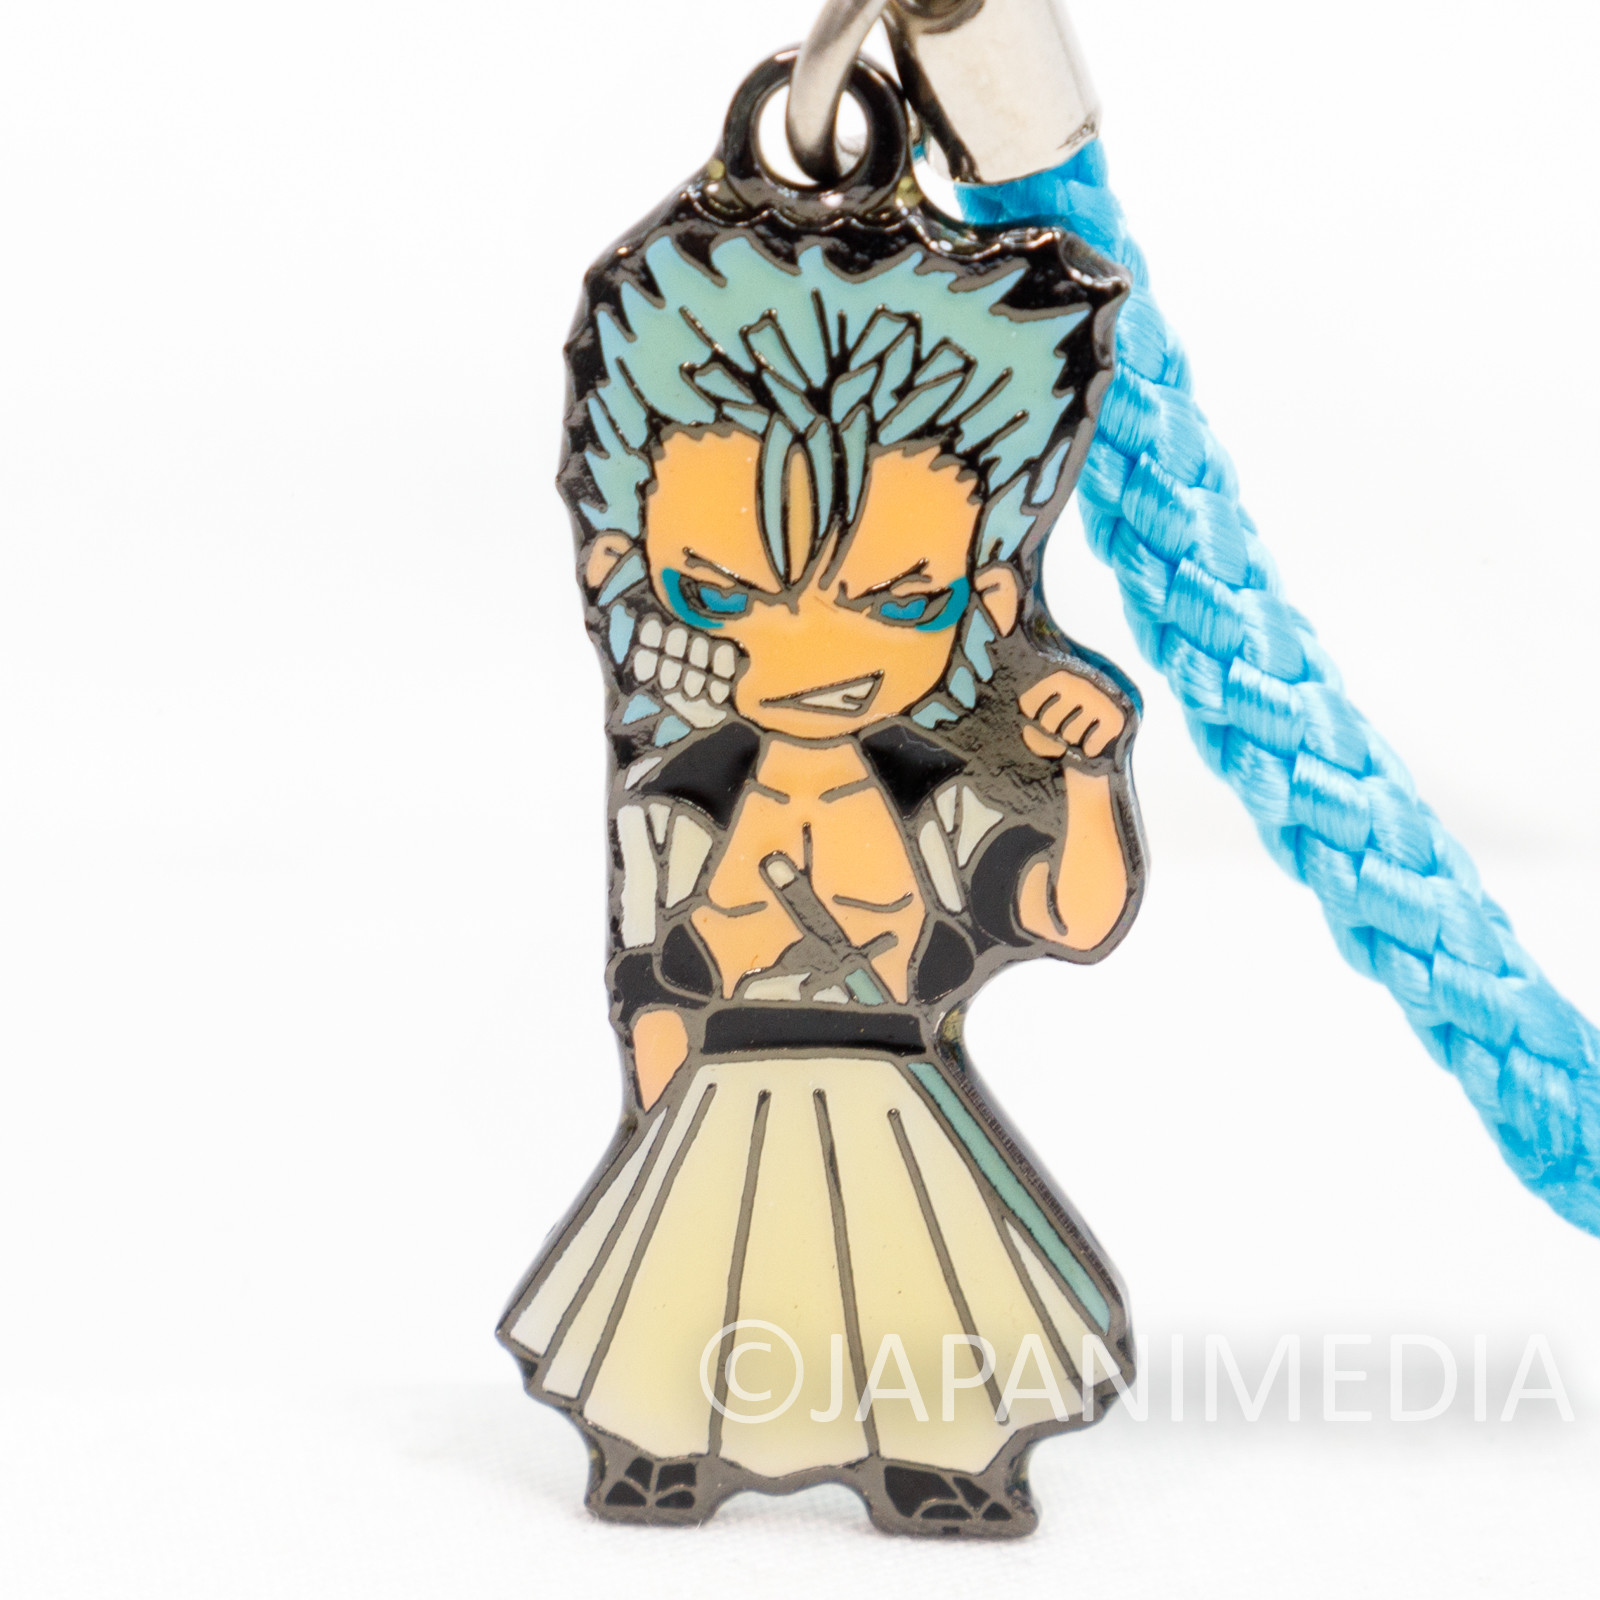 BLEACH Grimmjow Jaegerjaquez Character metal Mascot Strap JAPAN ANIME MANGA